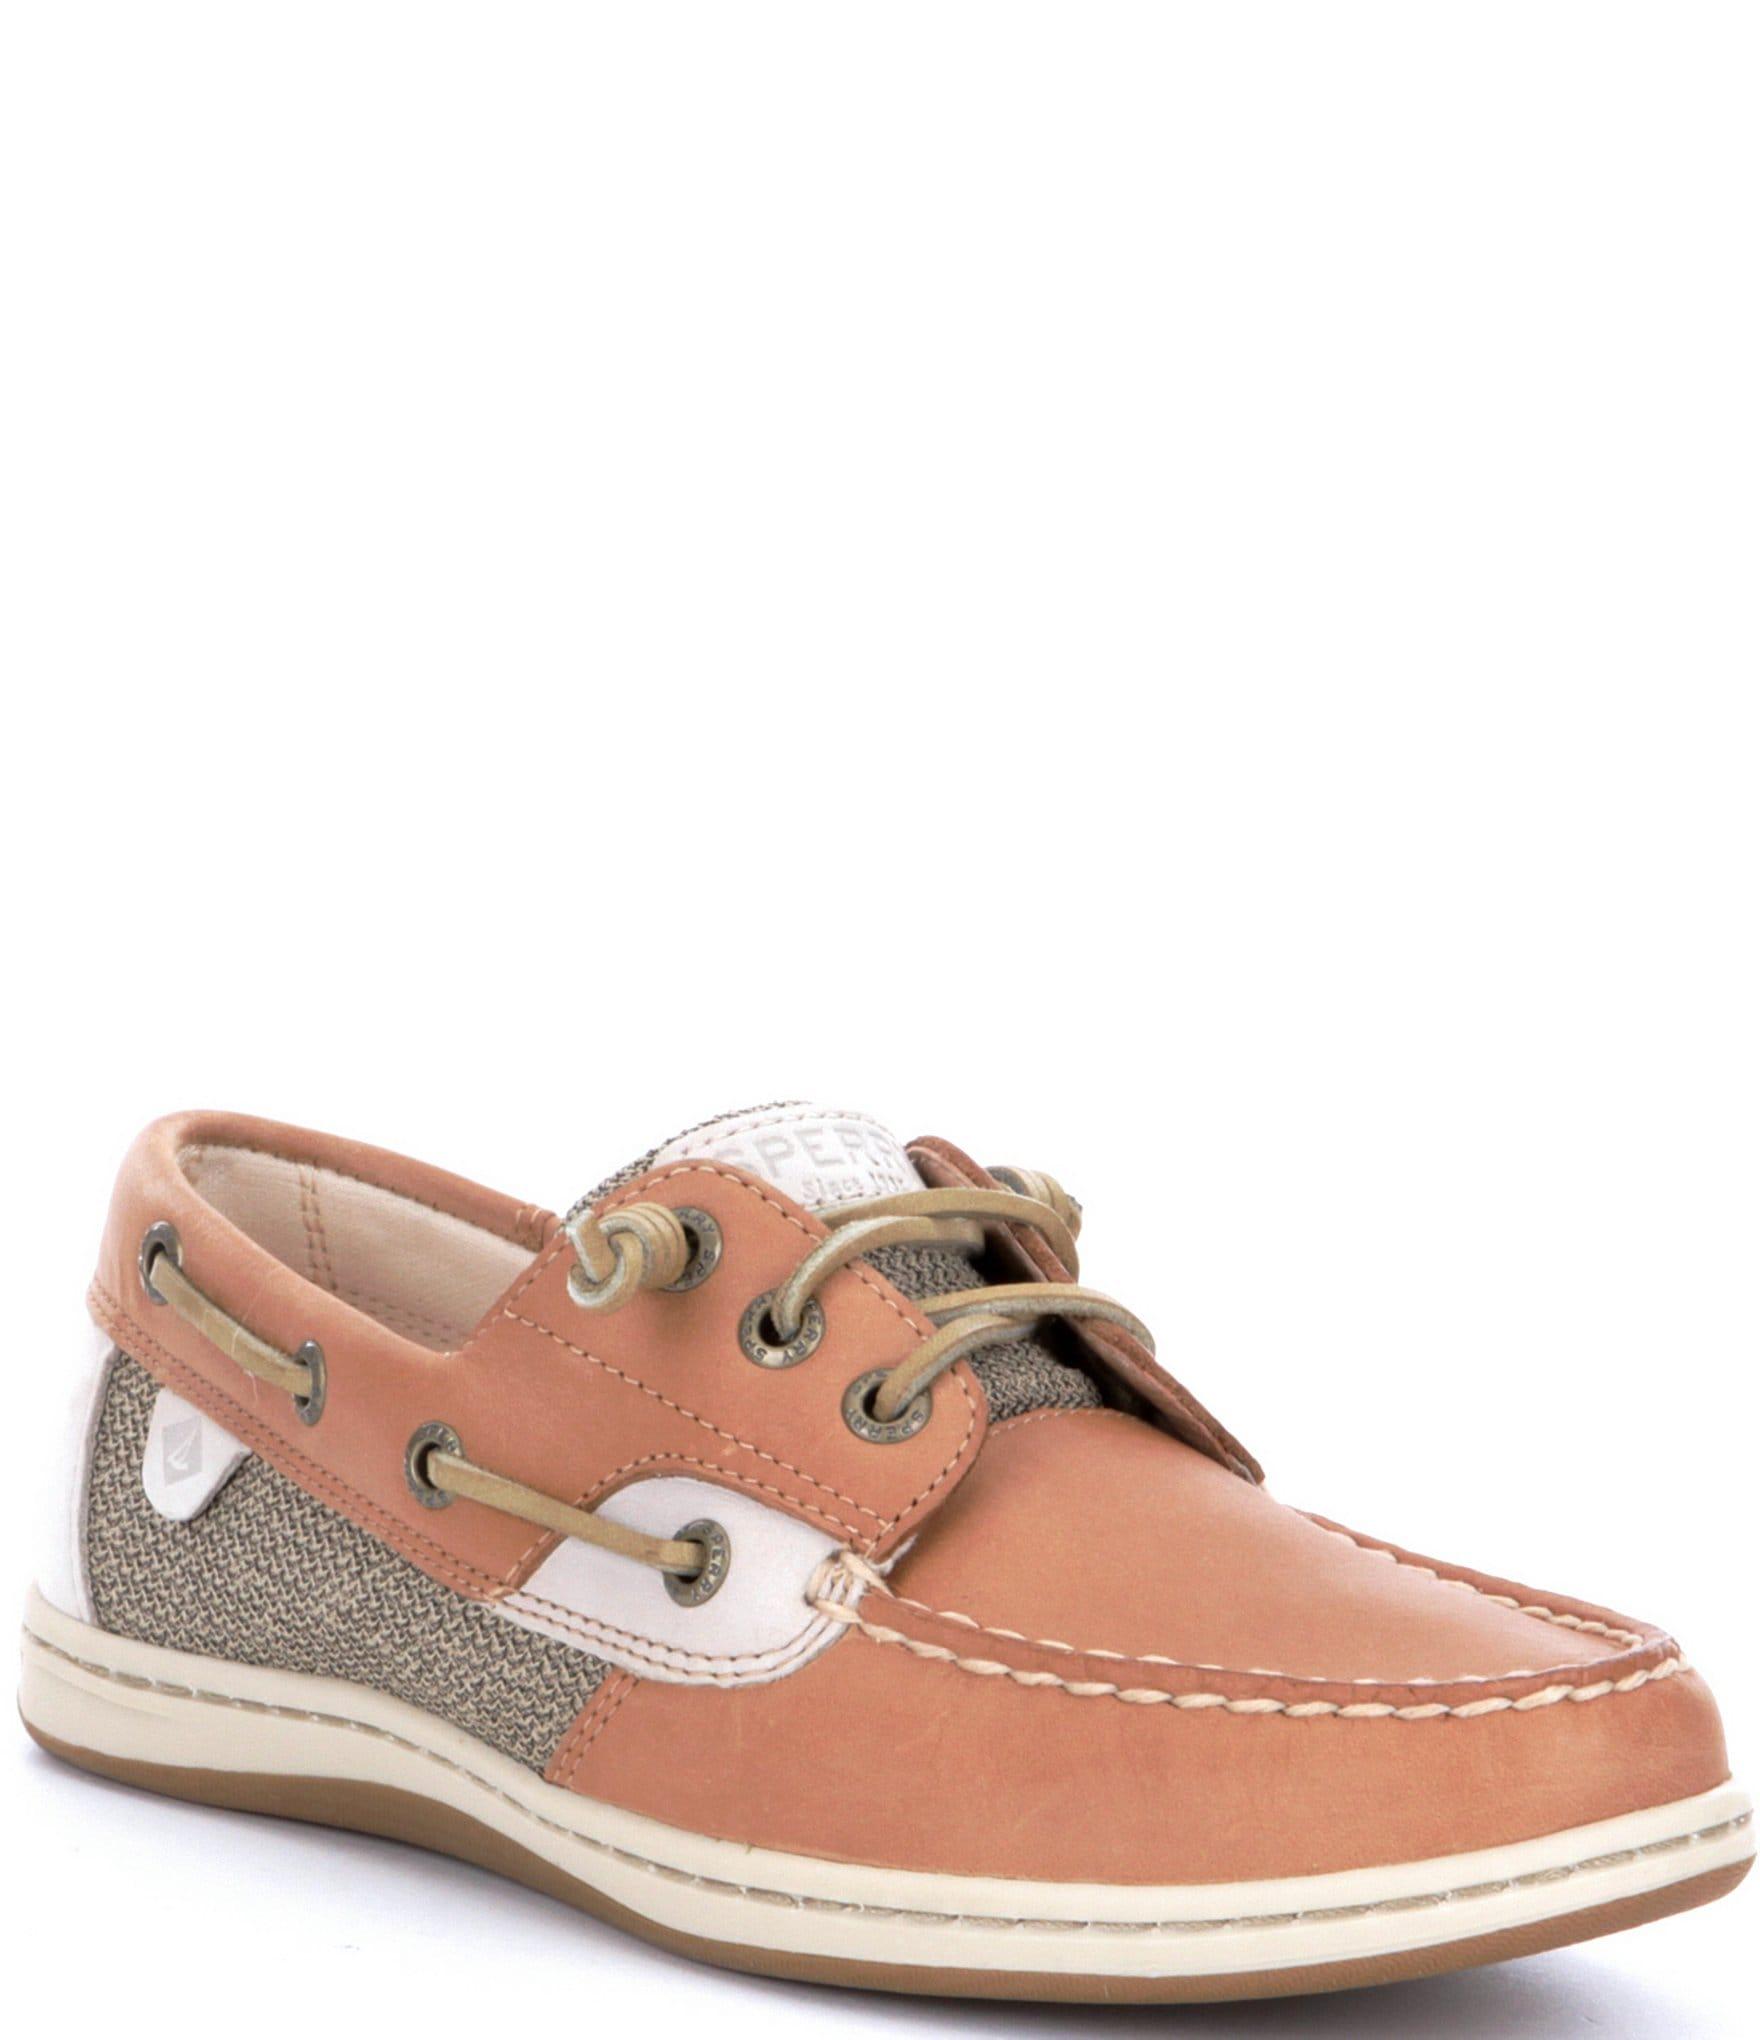 bdf5dc75f677 Sperry Women s Shoes